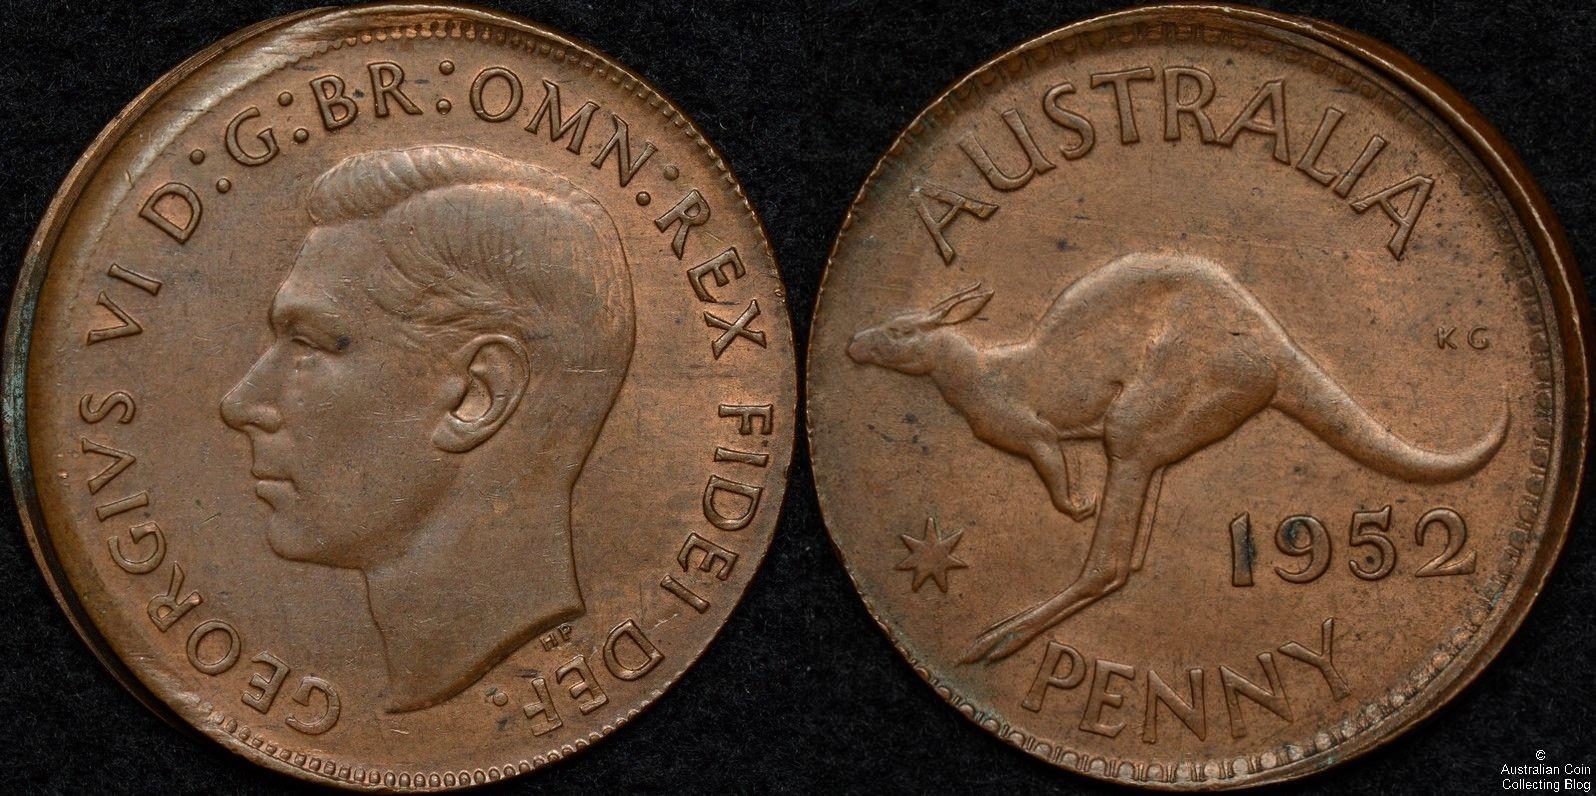 Australia 1952 Penny Ramstrike Error | Our Coin Catalog